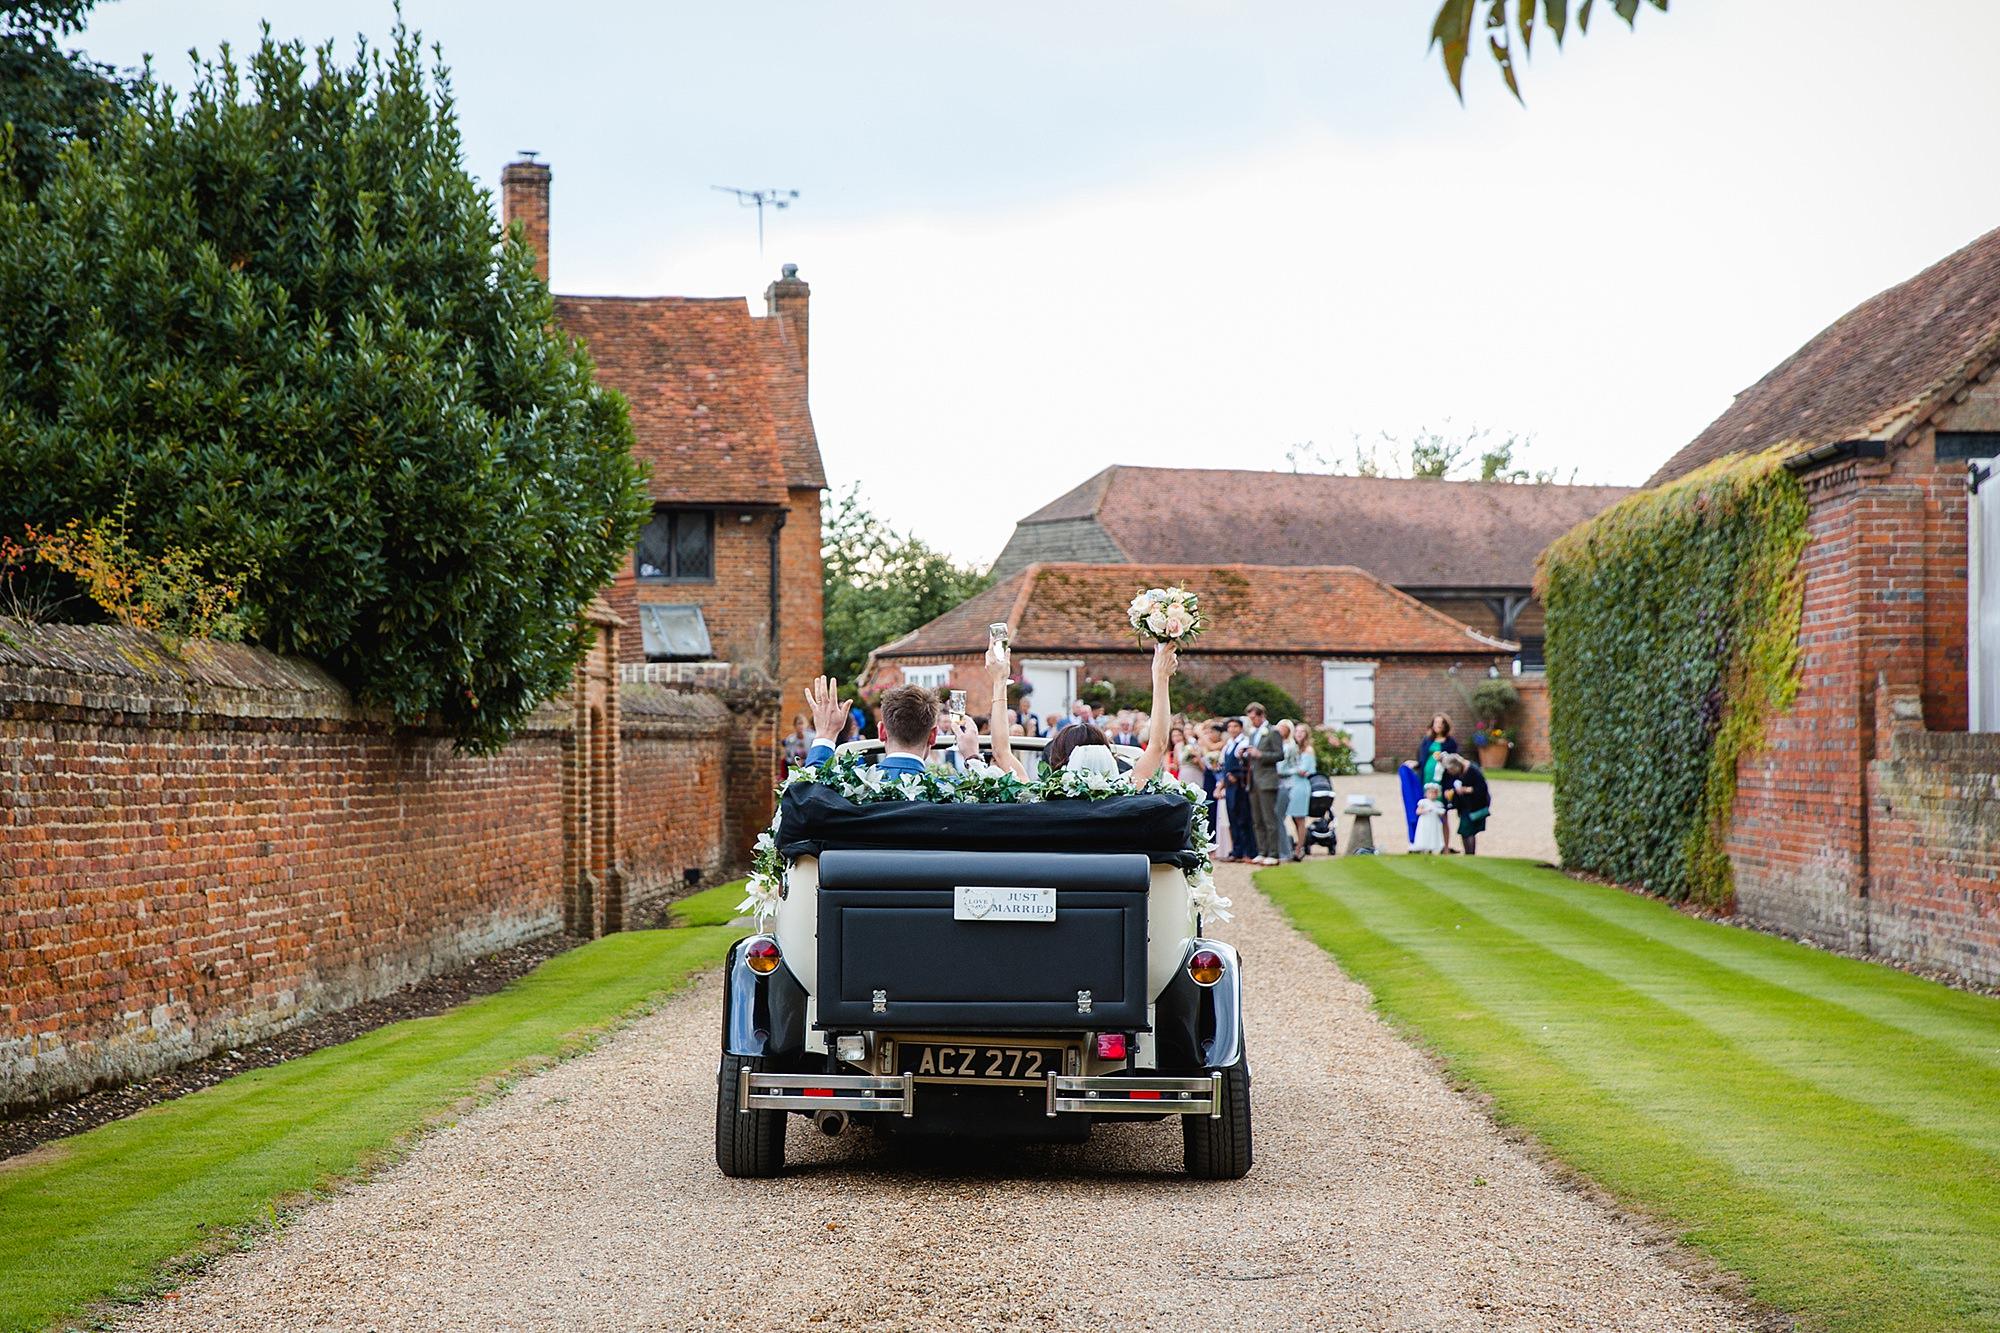 Lillibrooke Manor wedding bride and groom drive towards wedding guests